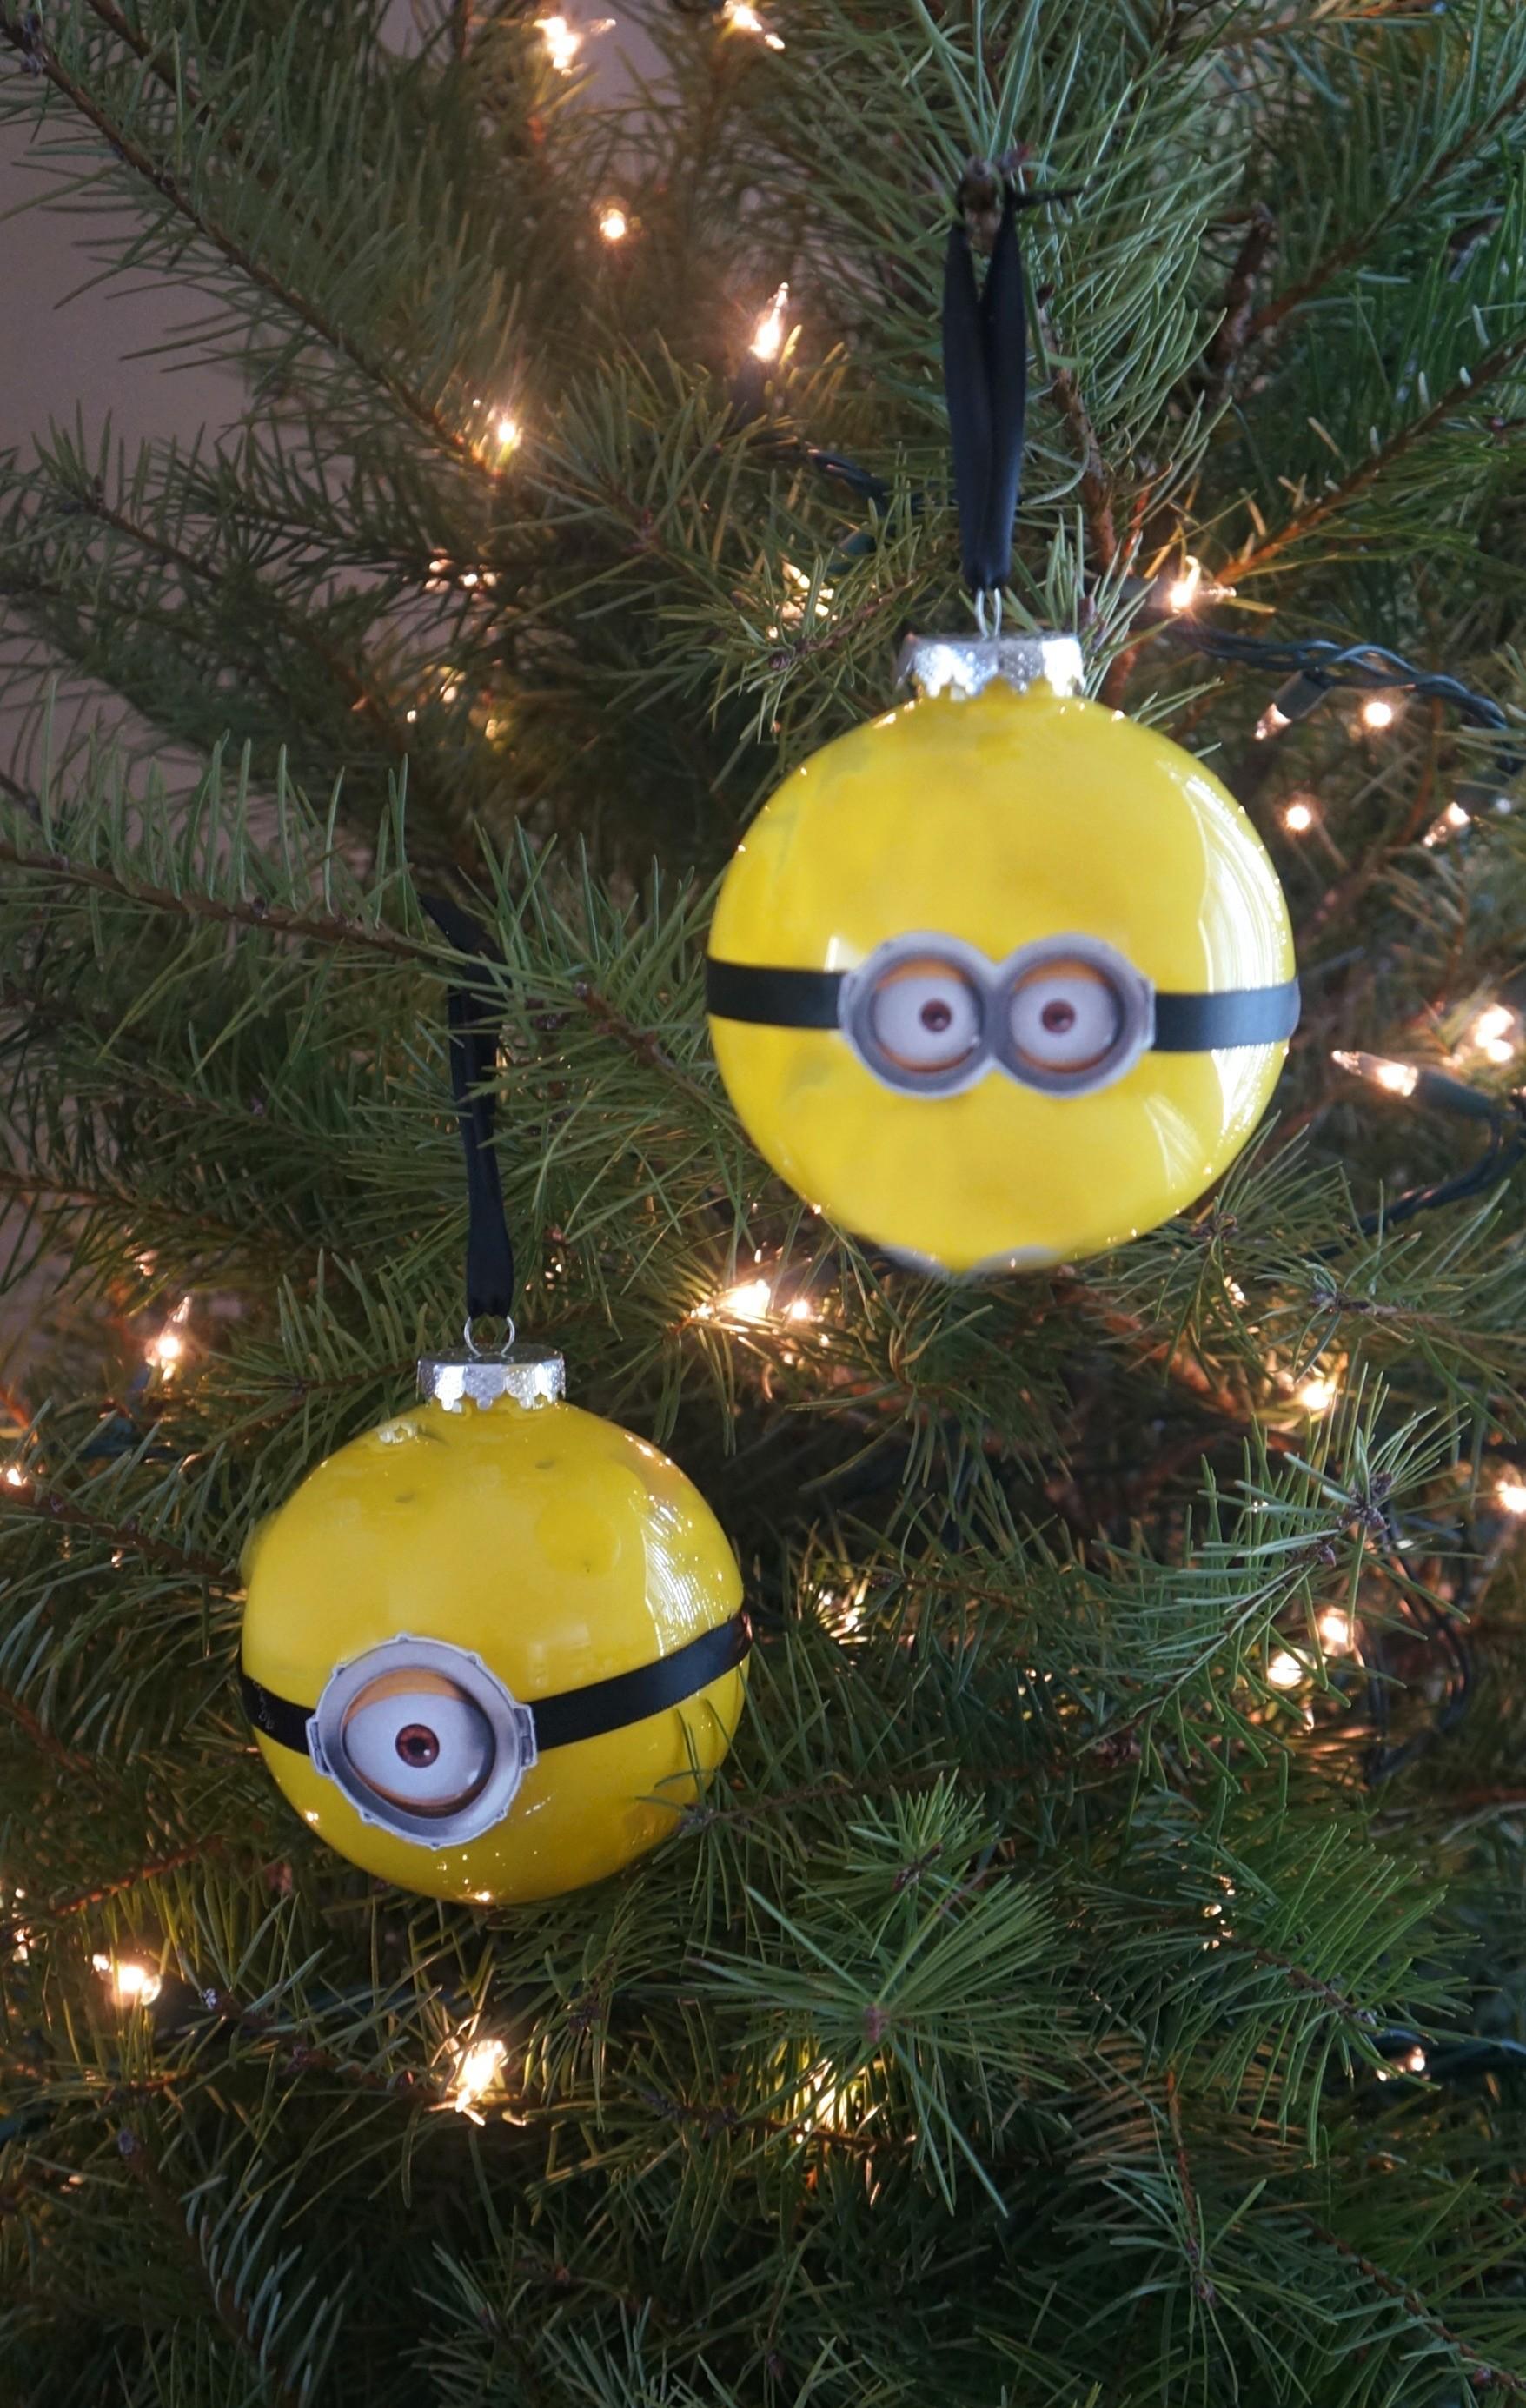 diy minion christmas ornaments tutorial - Minion Christmas Ornaments